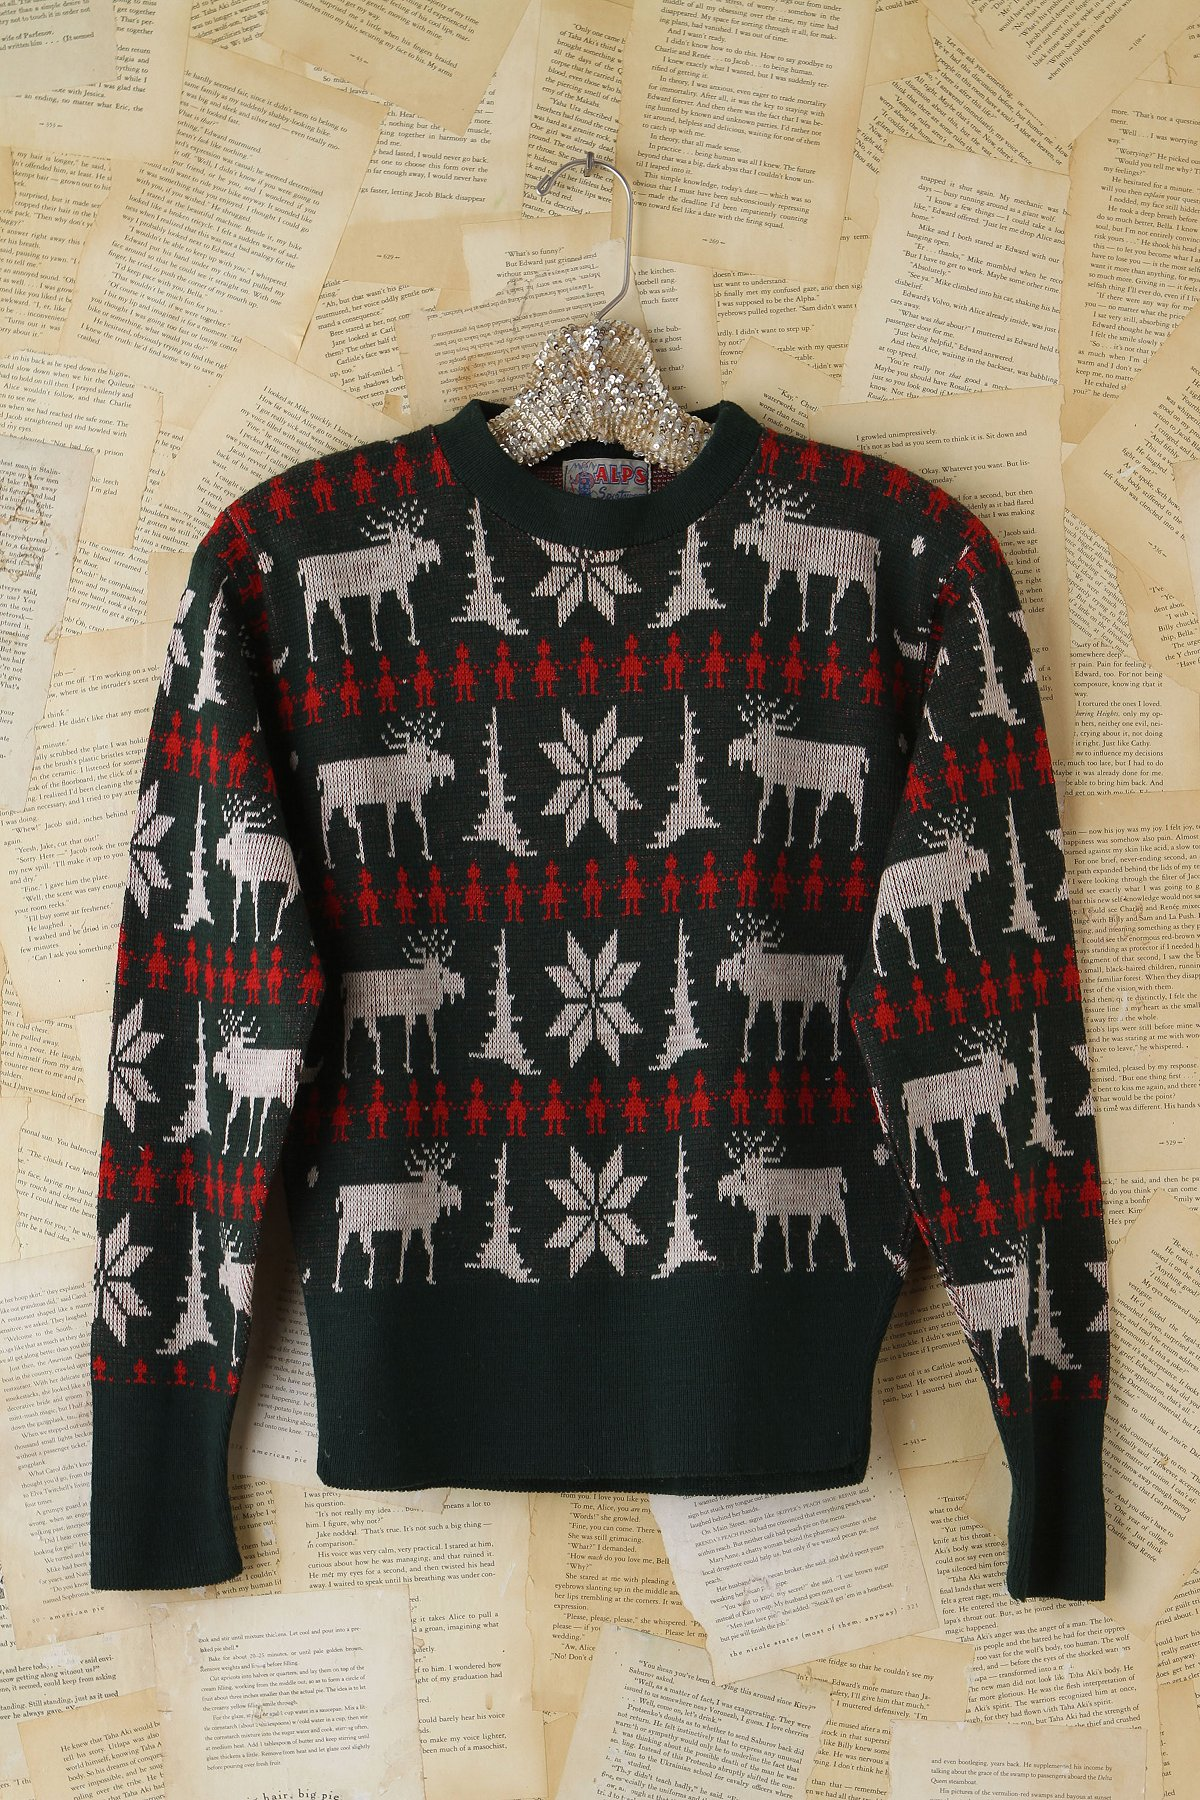 Vintage Reindeer Patterned Sweater